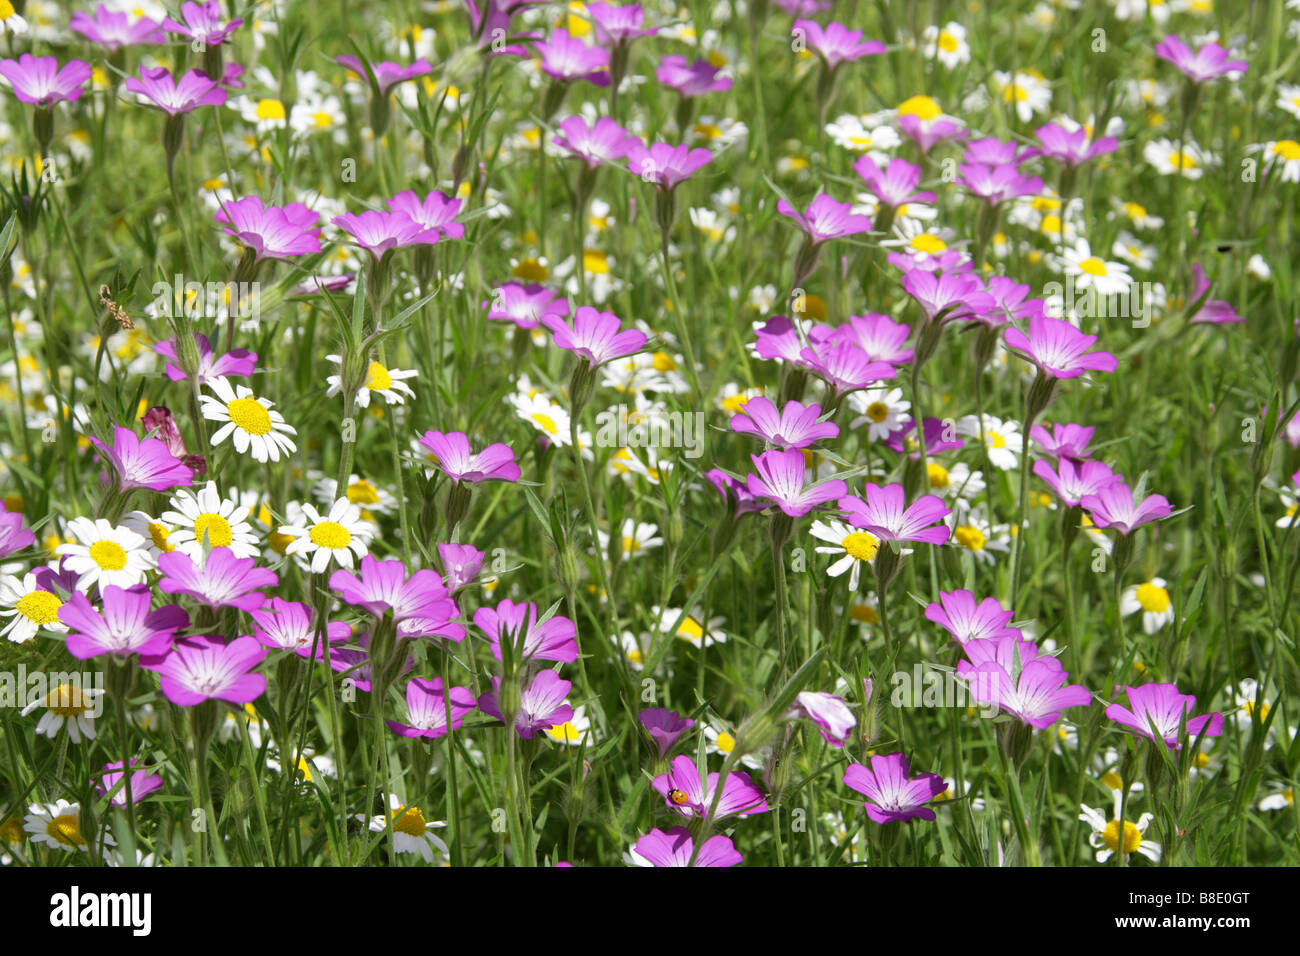 La nielle, Agrostemma githago, Caryophyllaceae et Ox Eye Daisies Chryanthemum leucanthemum Banque D'Images